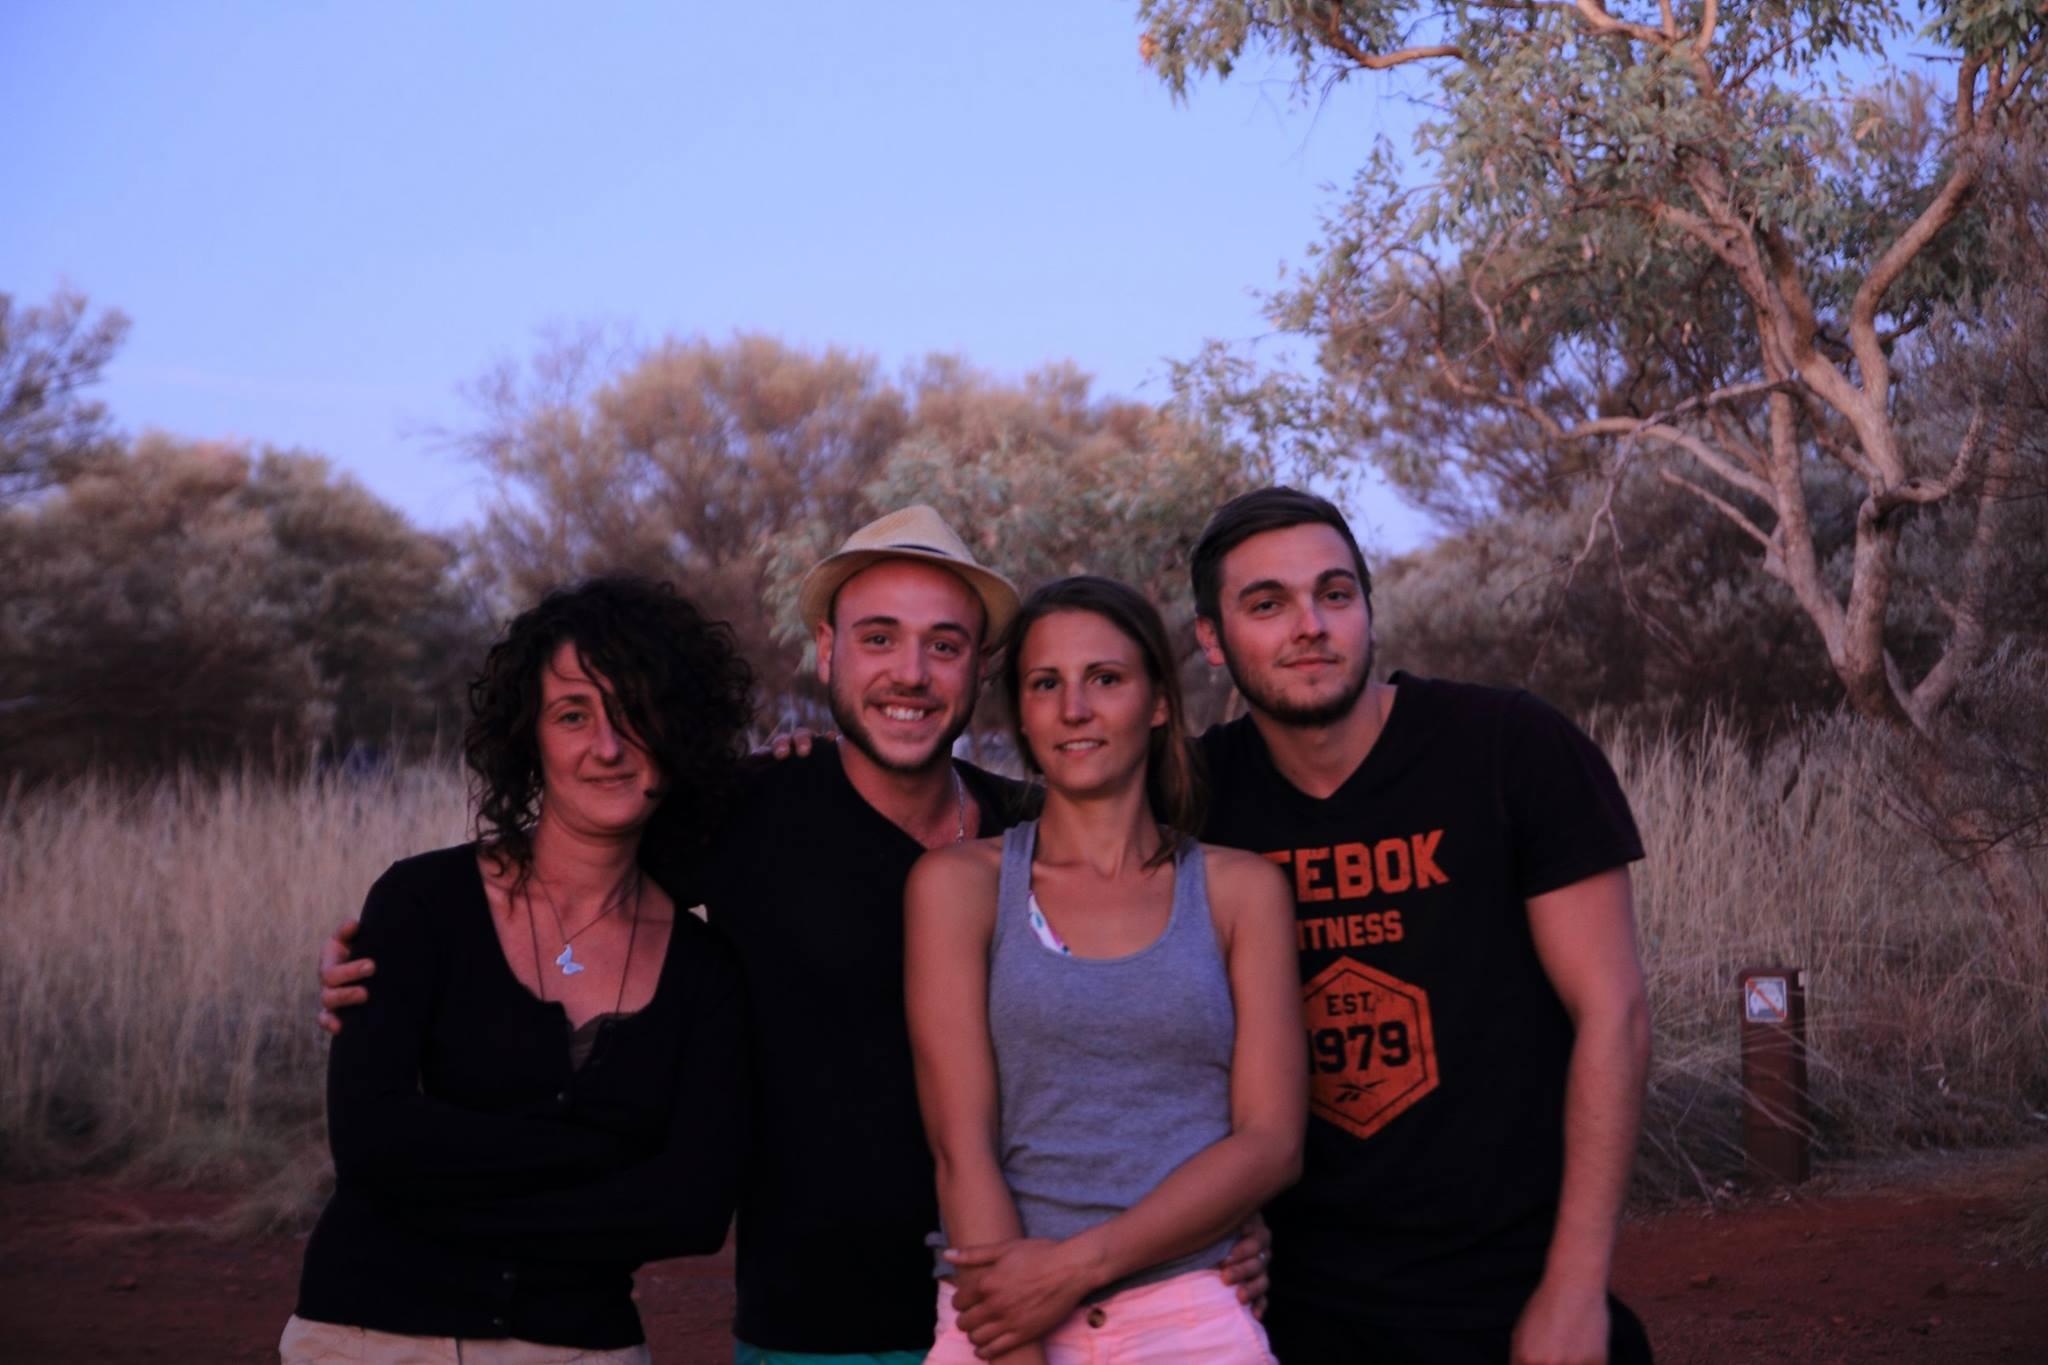 Charlotte, Benoit, Julie, Luc - French